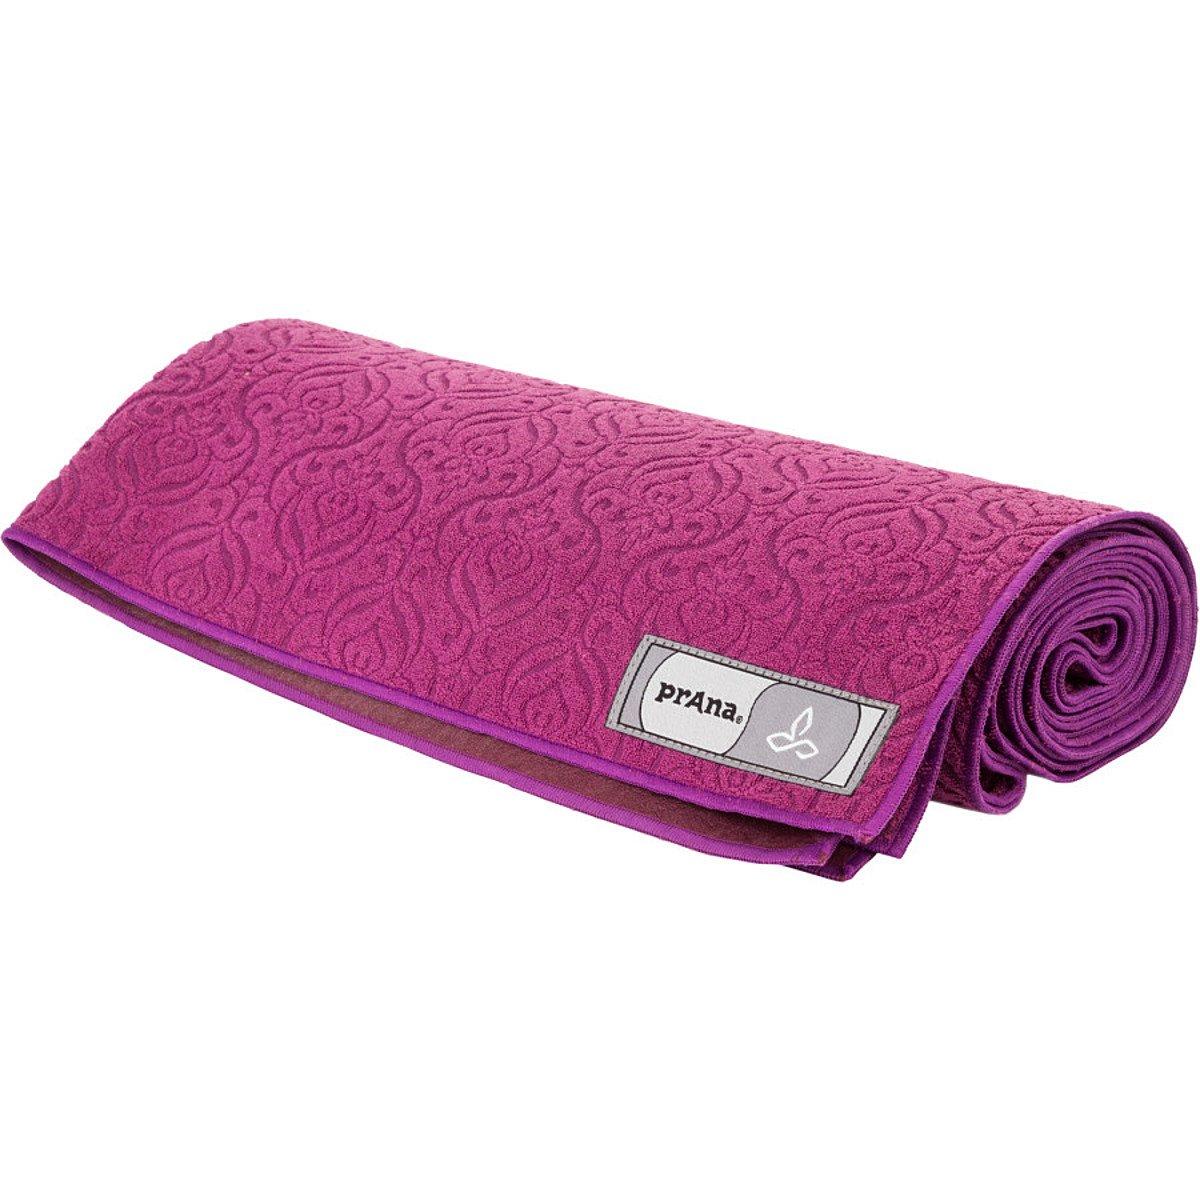 Amazon.com : prAna Synergy Towel Mat Pomegranate, One Size ...